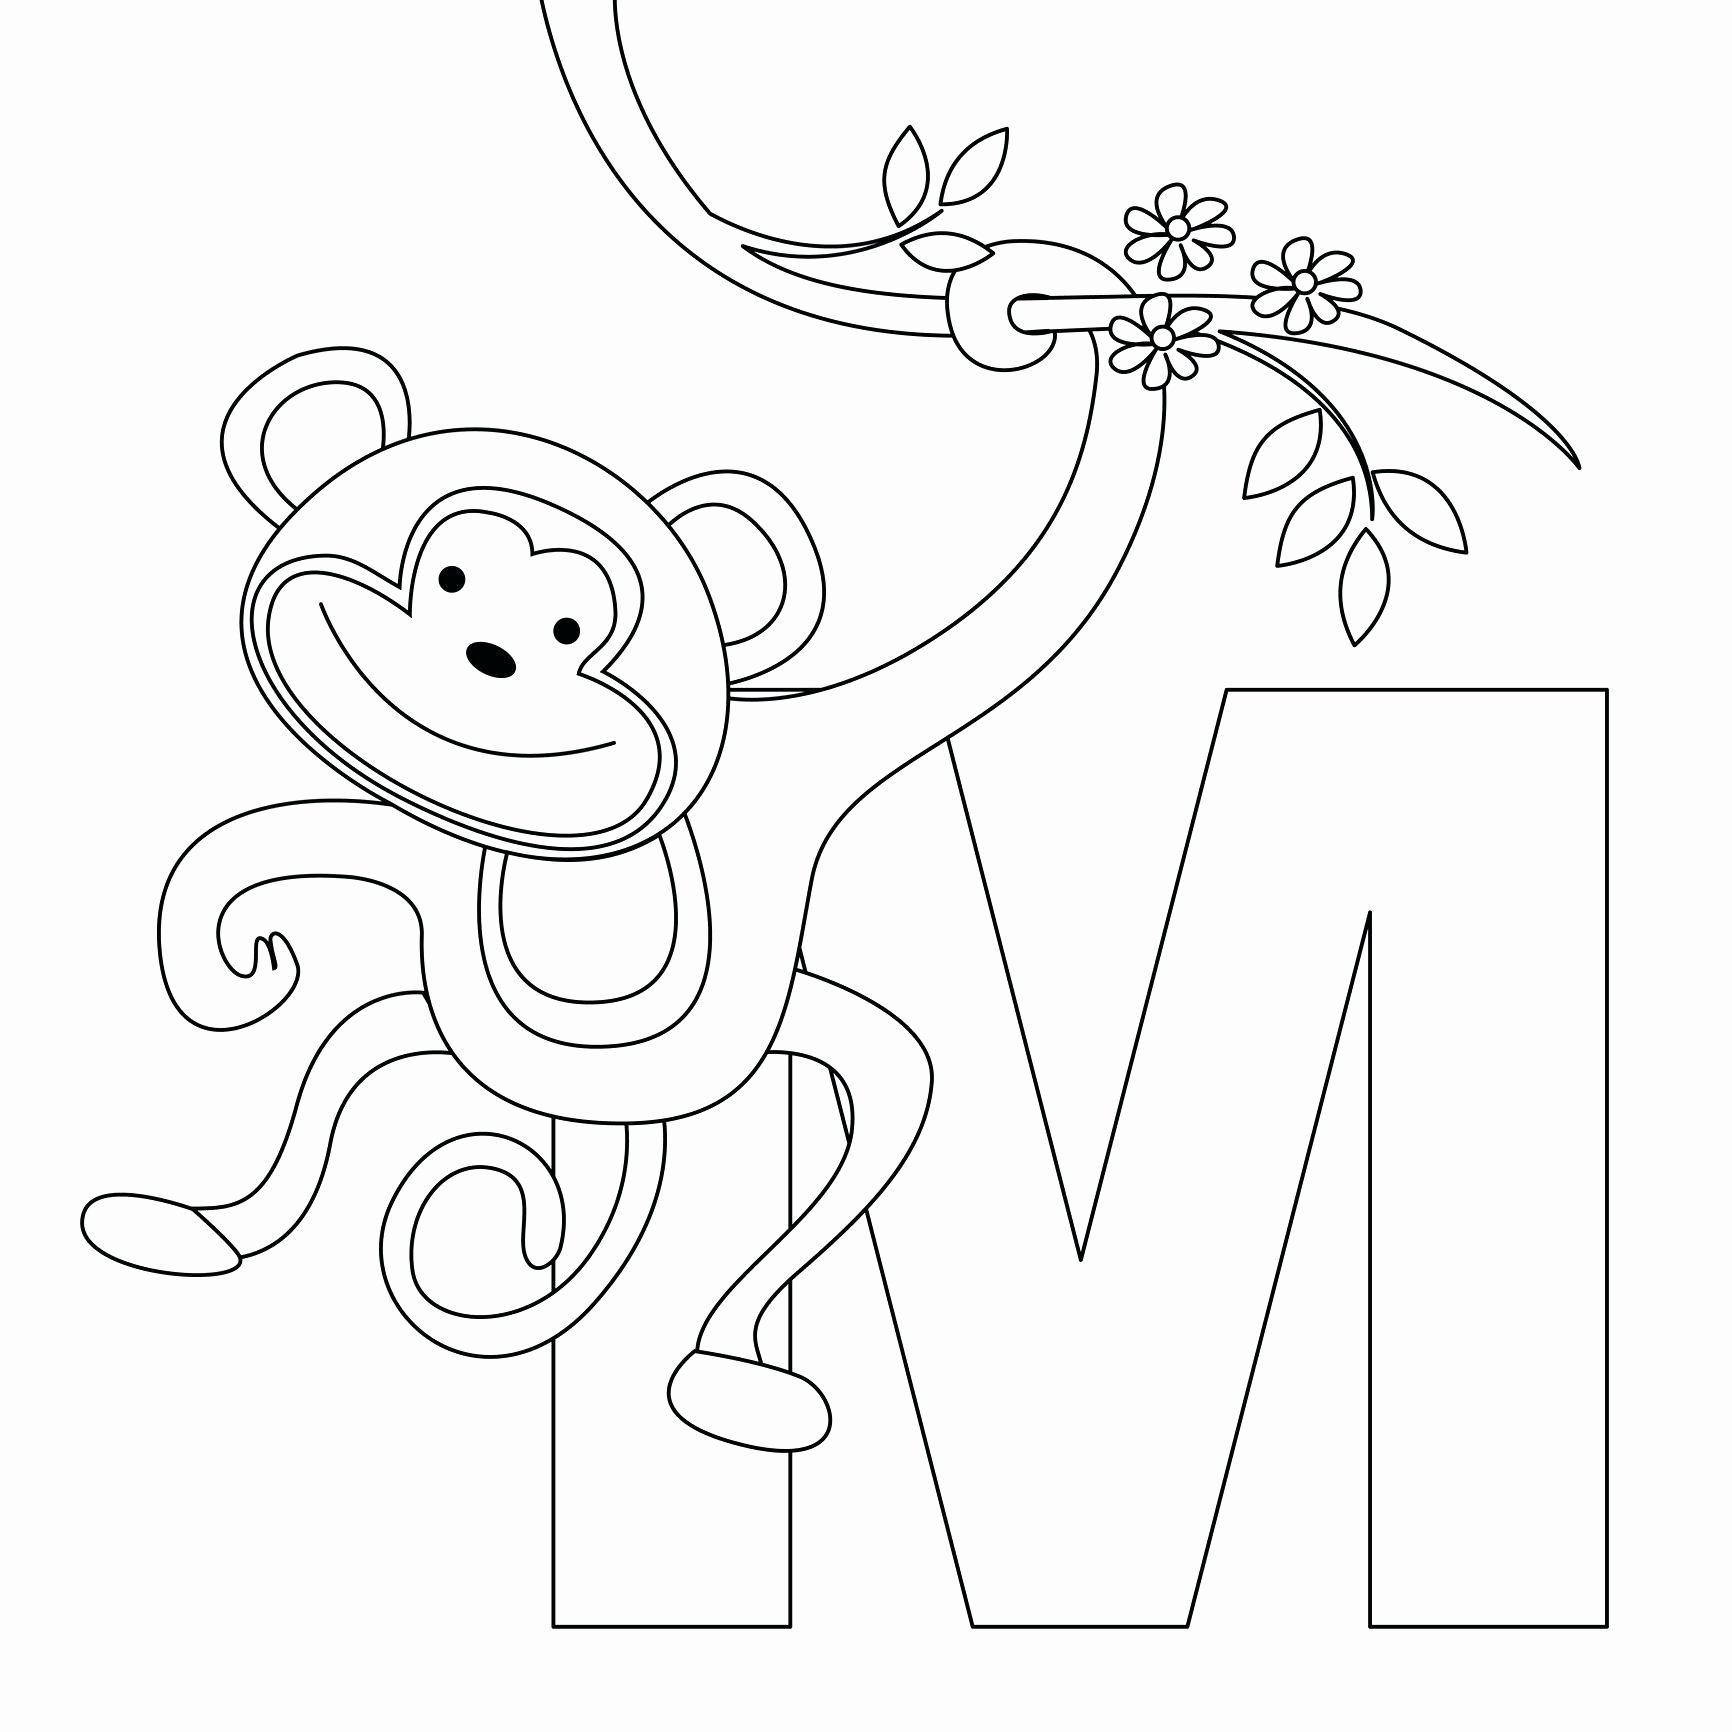 Alphabet Coloring Pages Pdf Alphabet Coloring Pages Monkey